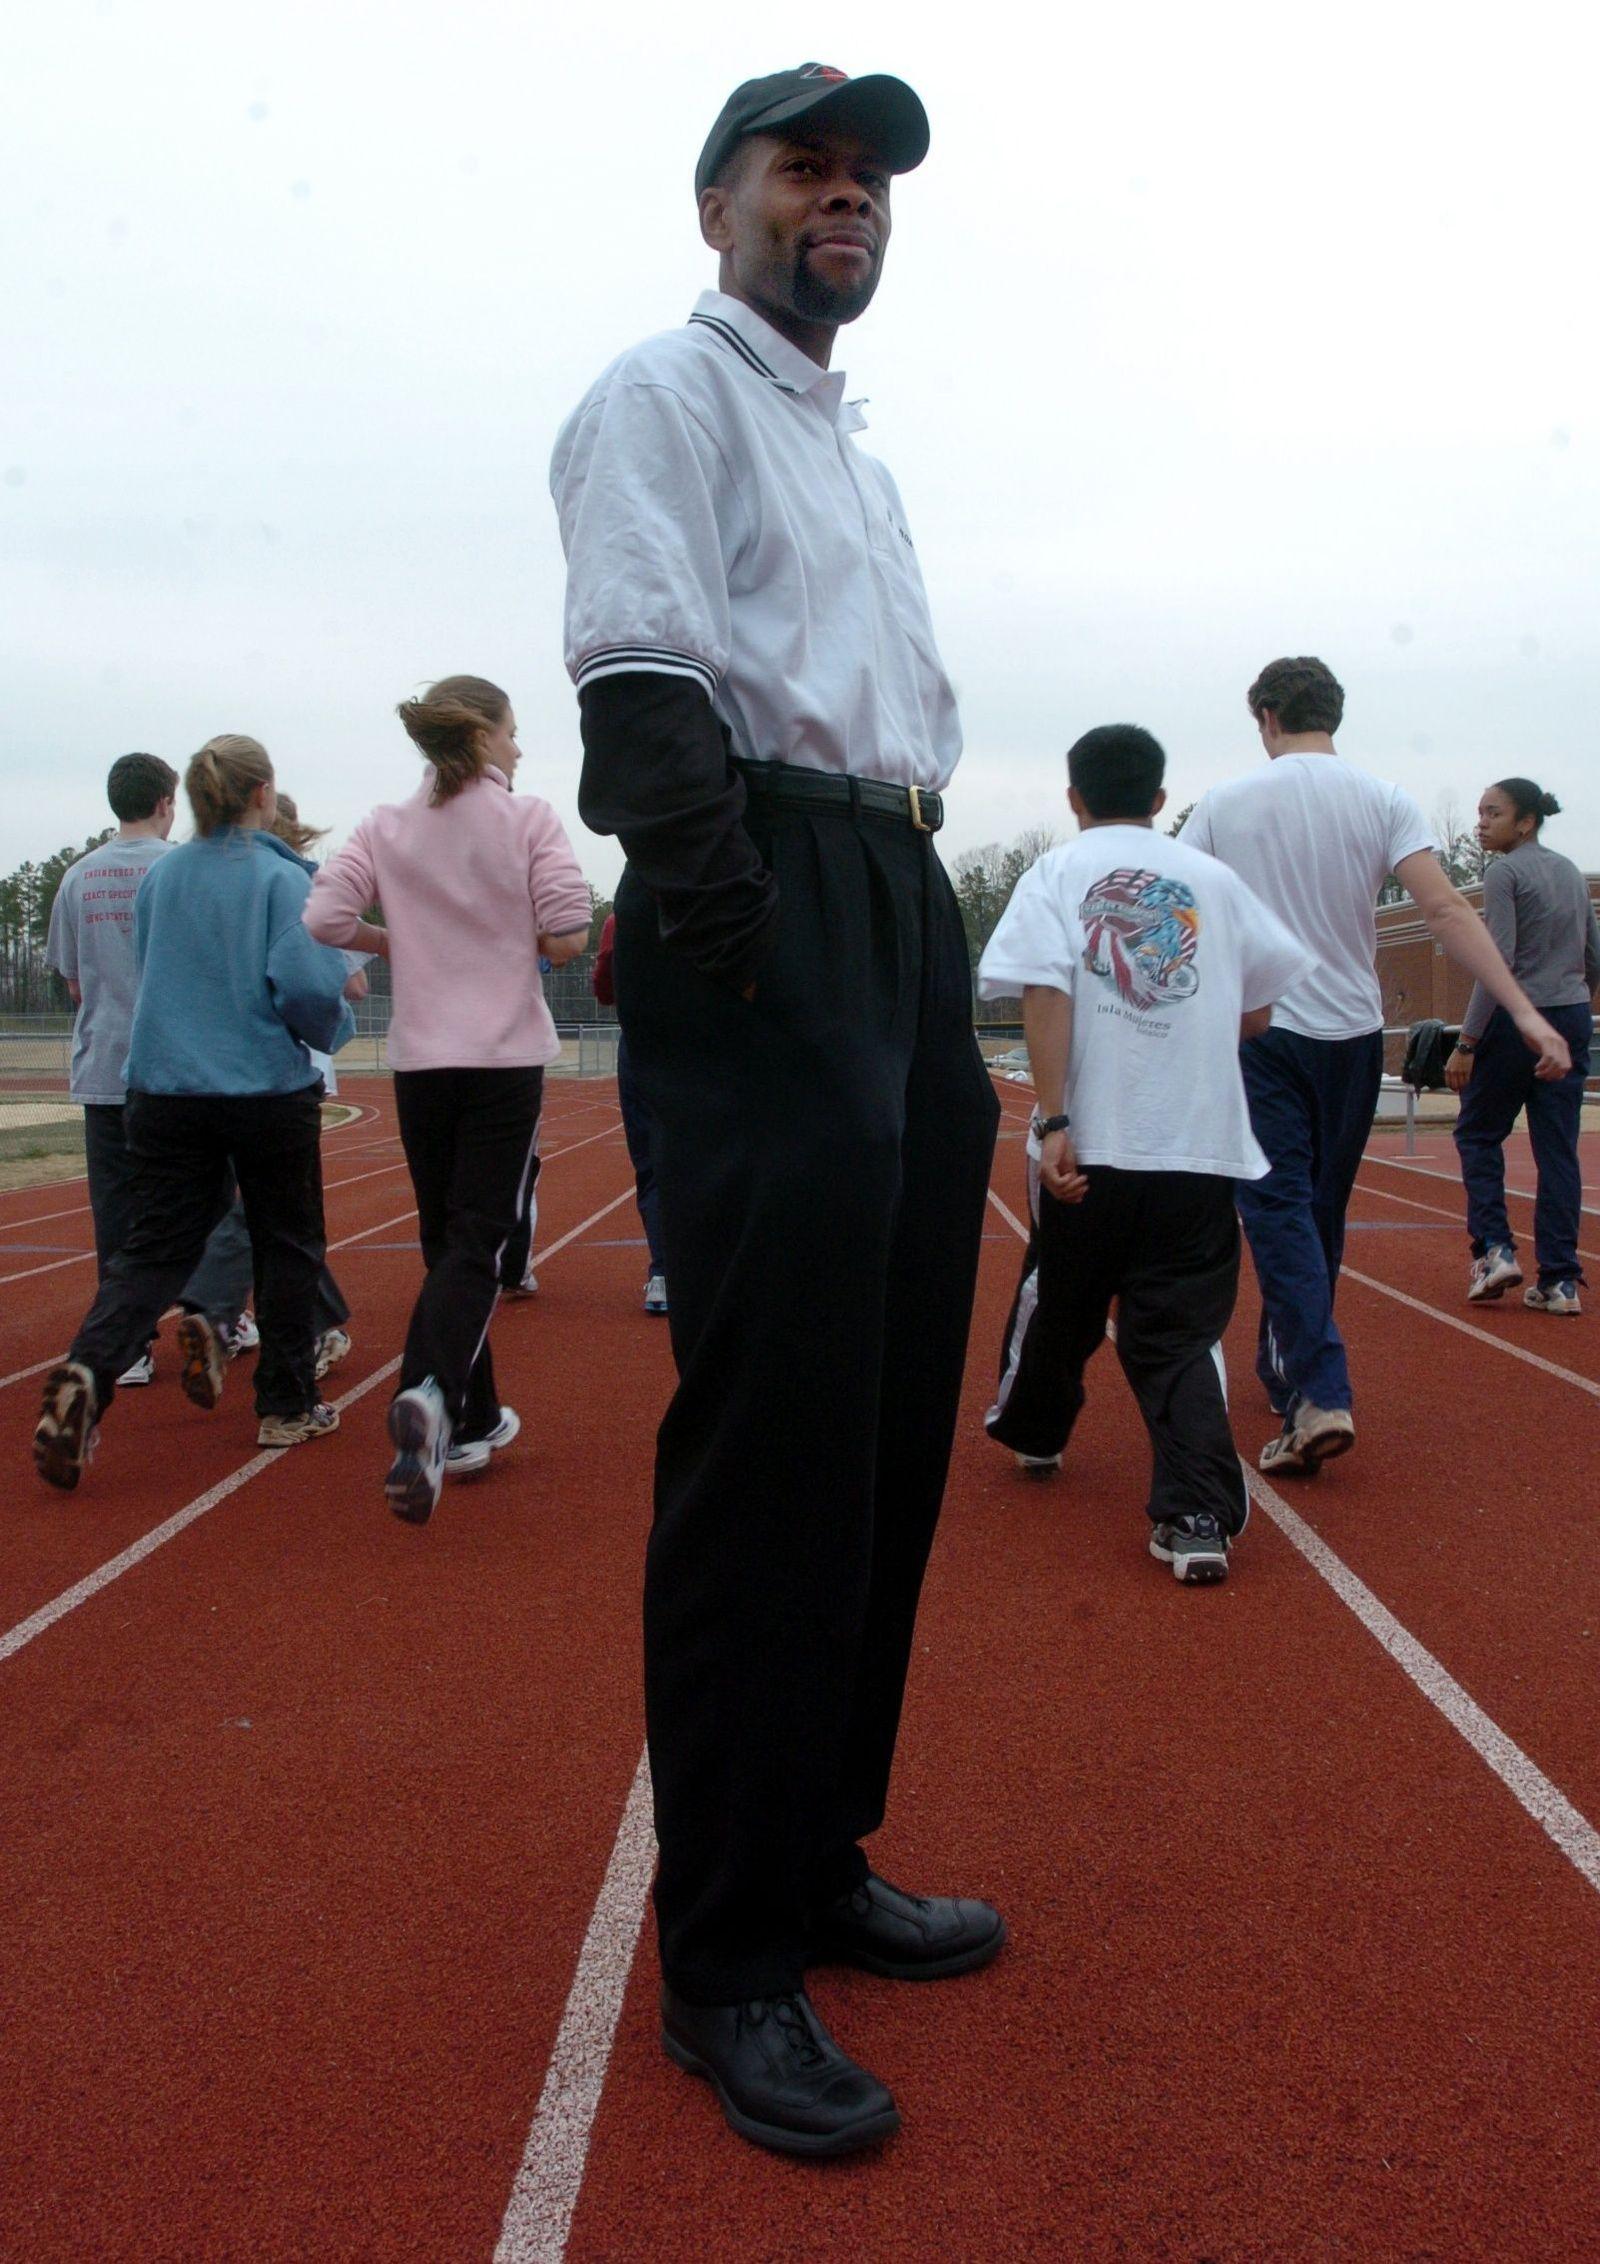 NCarolina Perttigrew Death Athletics